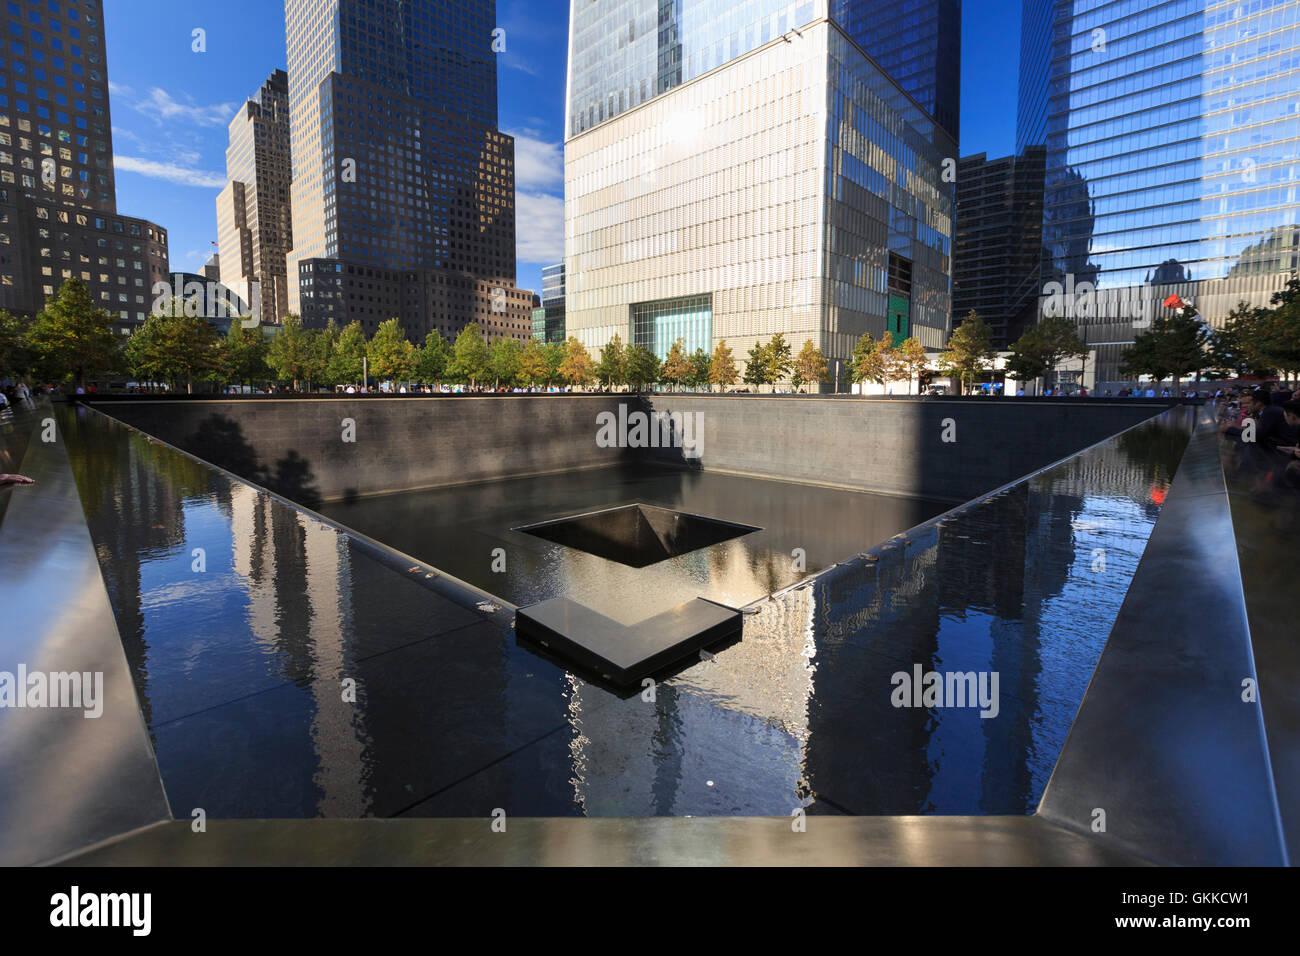 USA, New York, New York City, Manhattan, National Semptember 11 Memorial - Stock Image